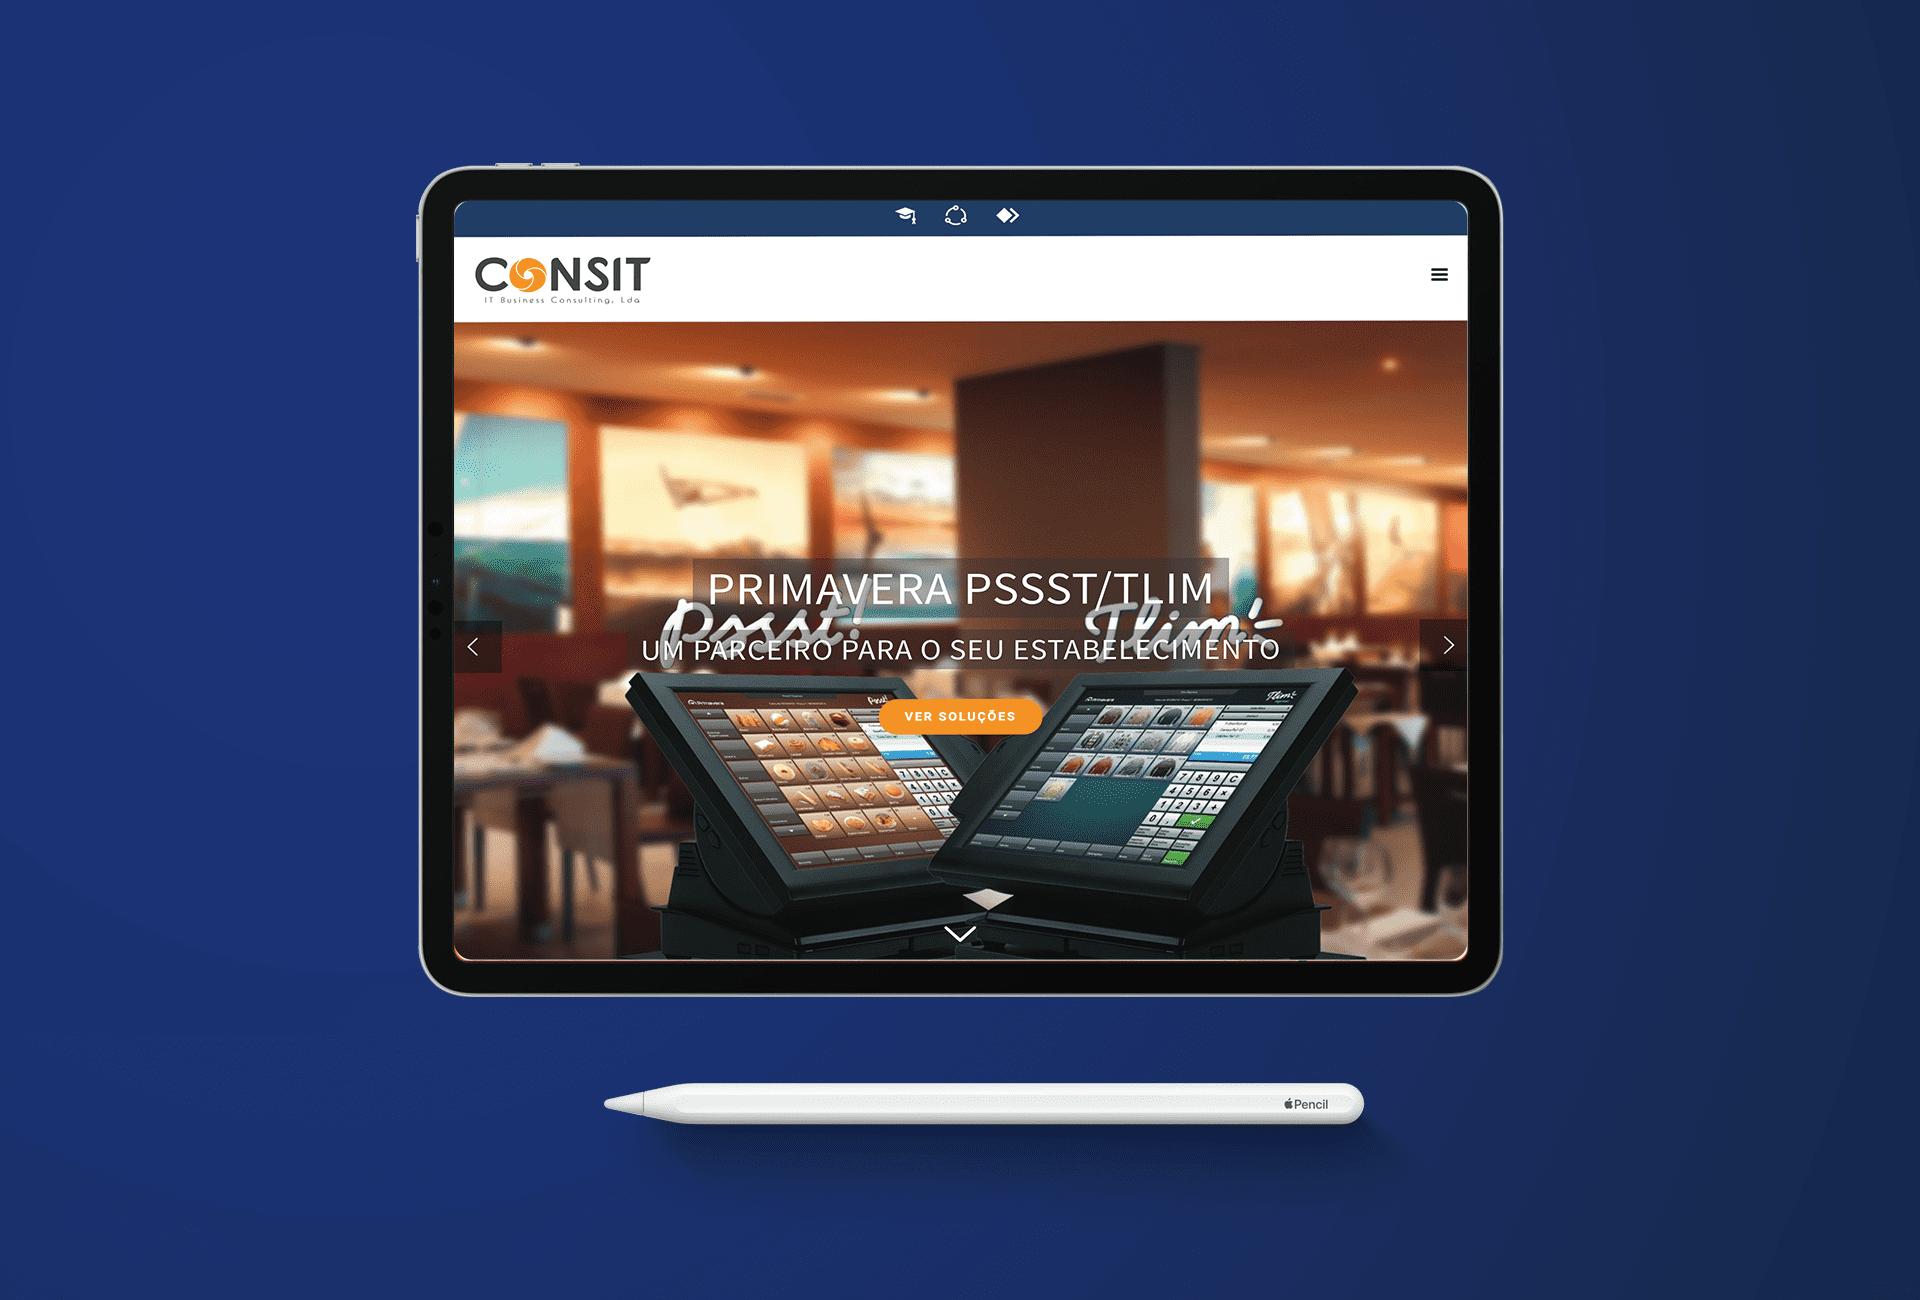 website consit - tablet